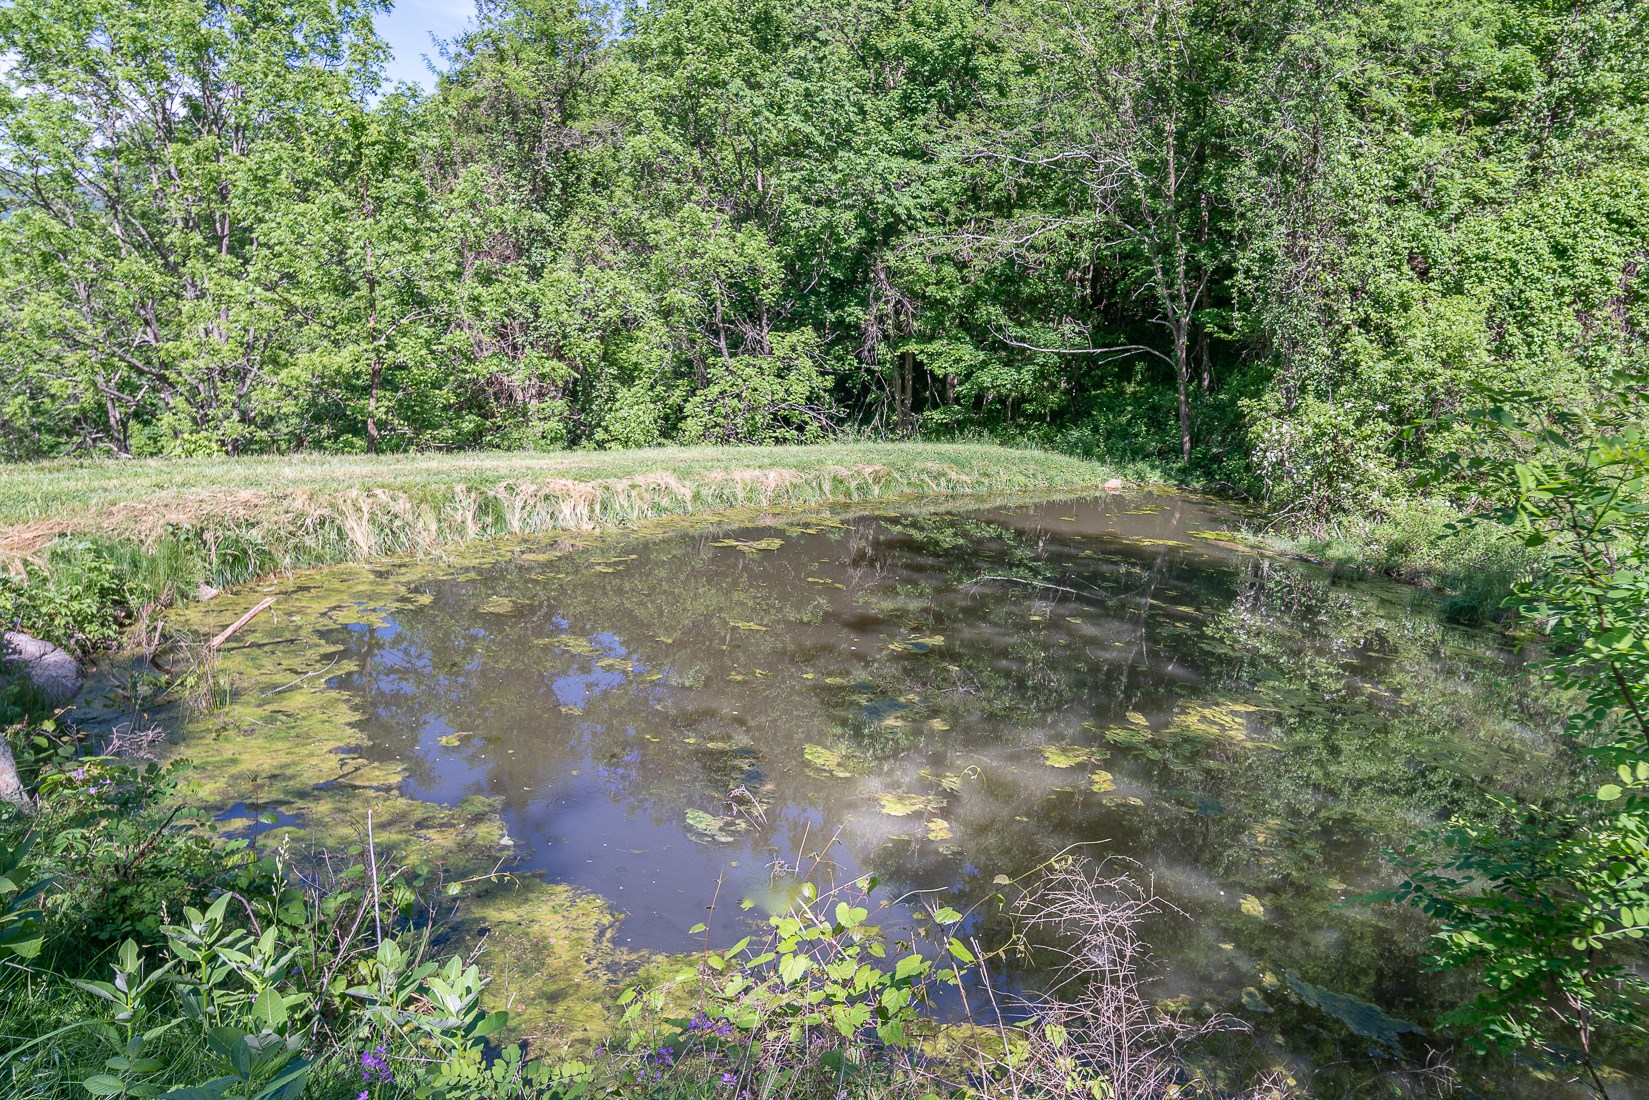 Turkey Foot Pond